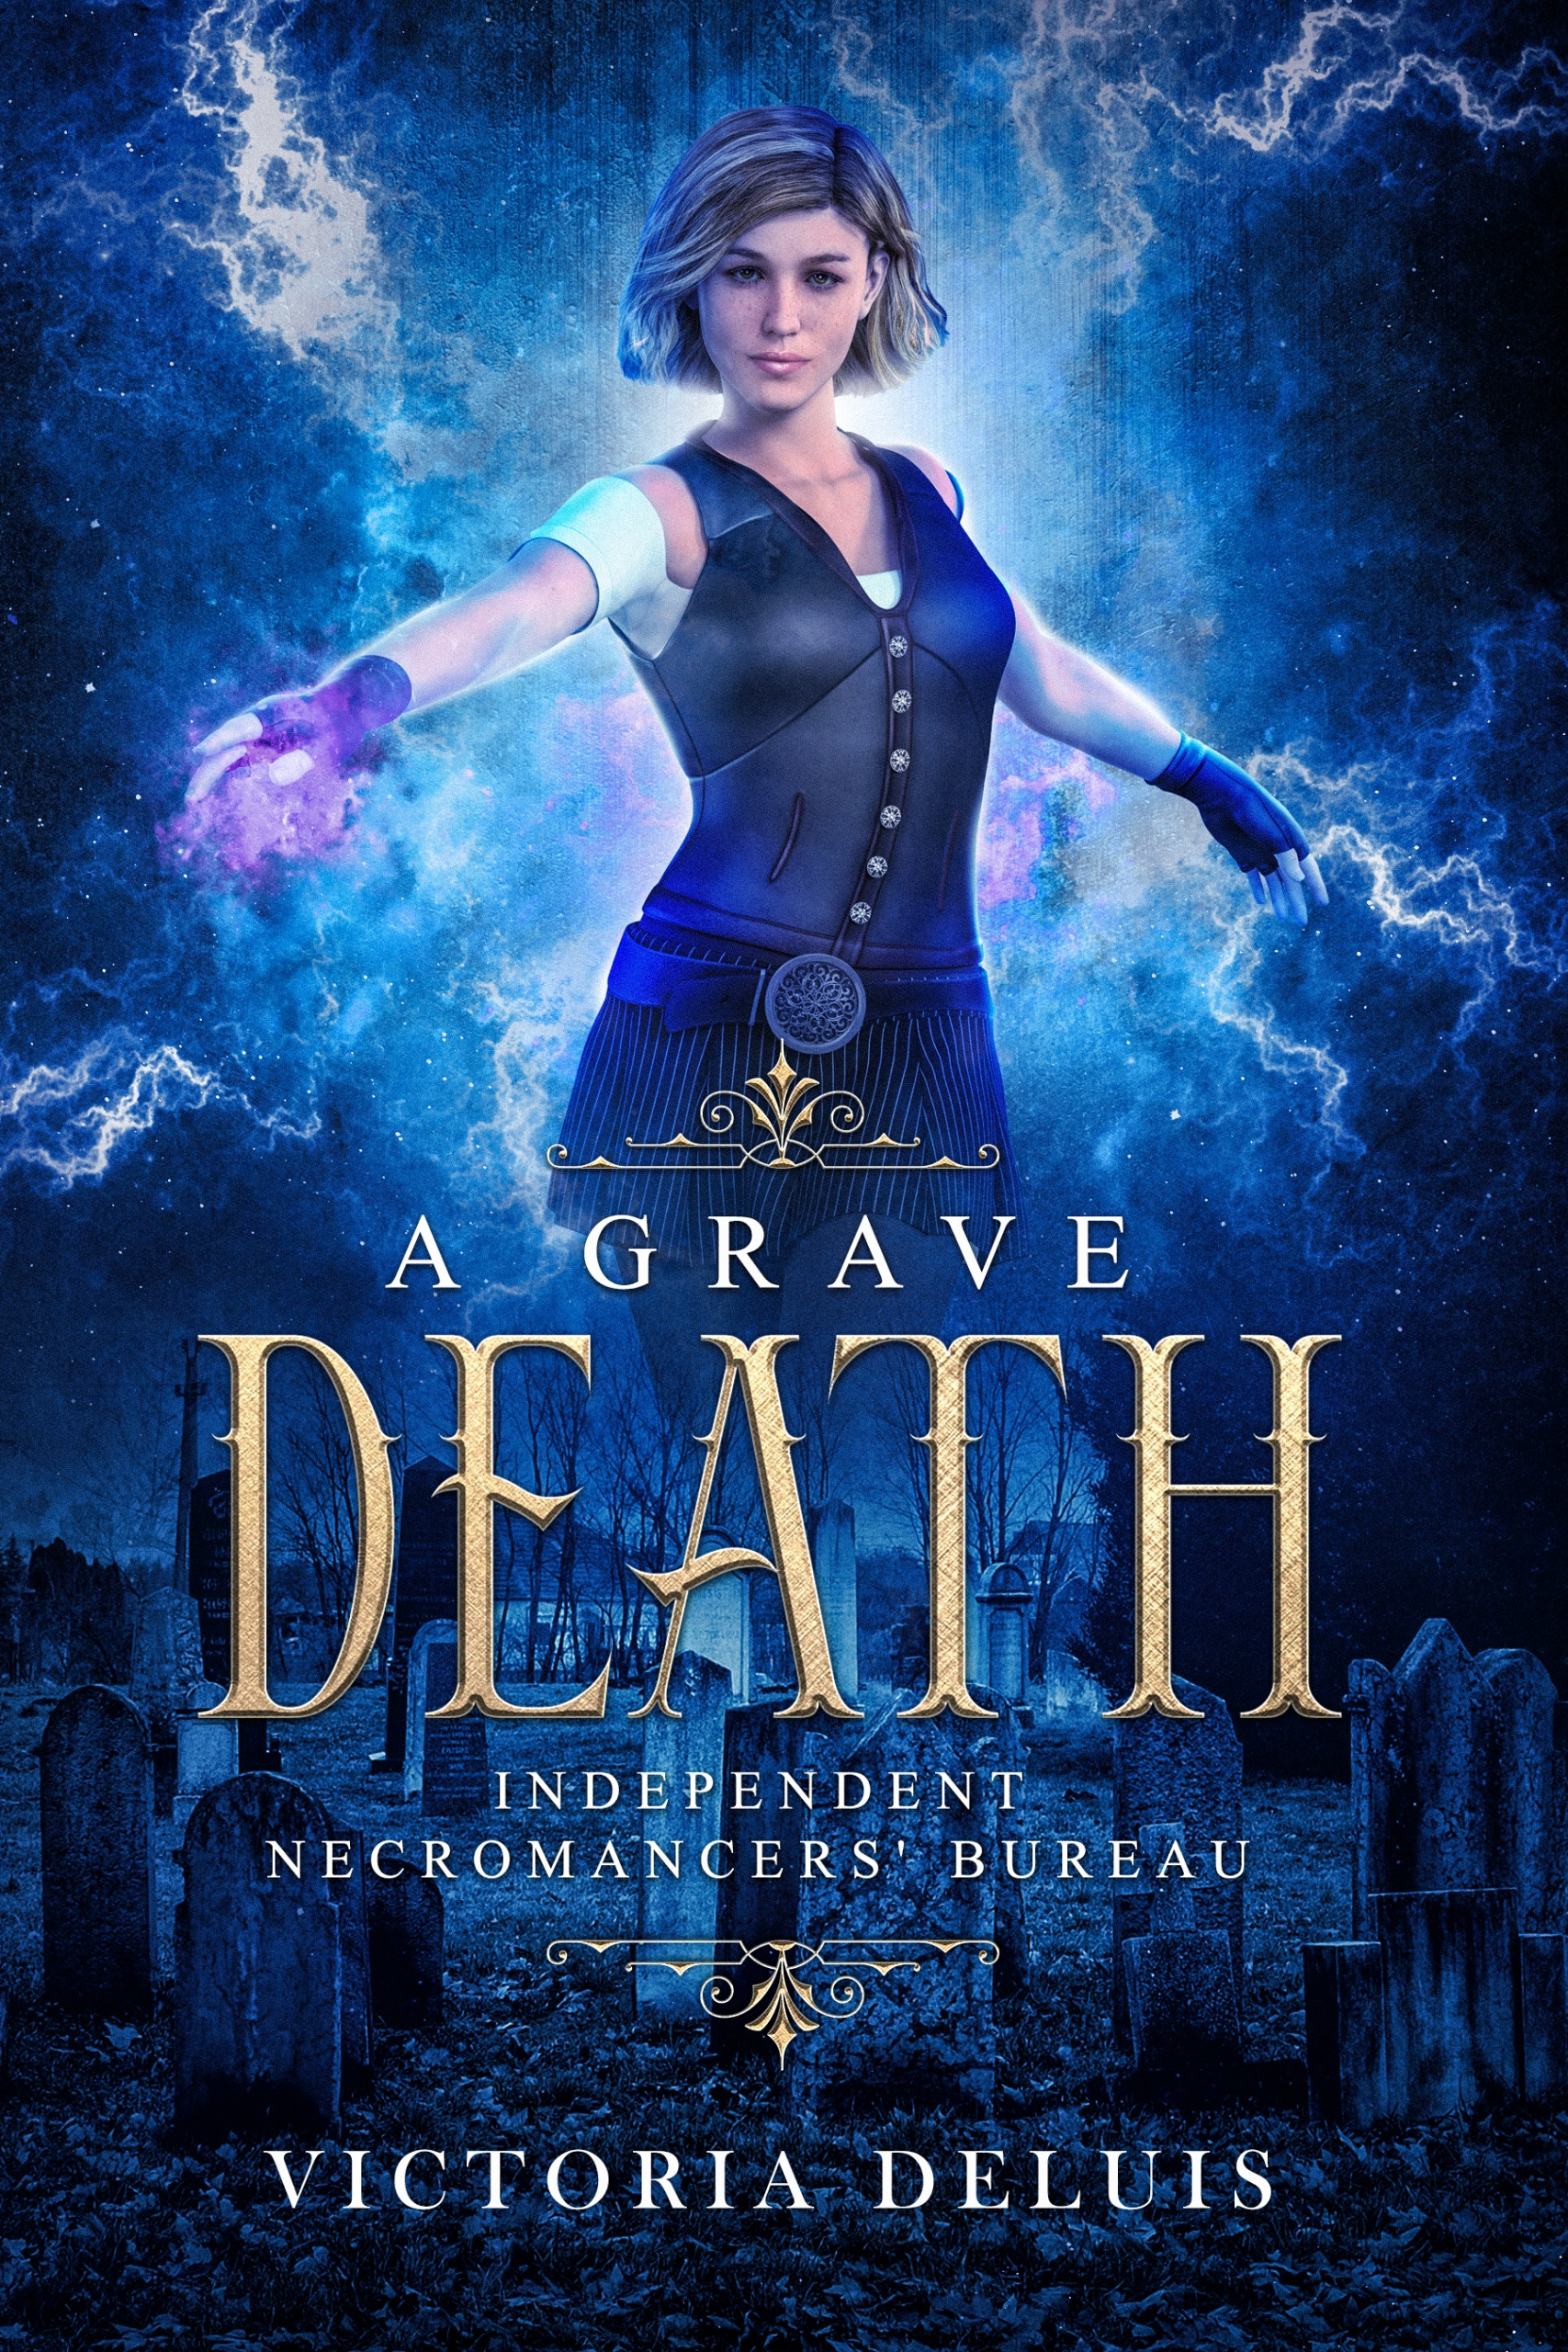 A Grave Death: Independent Necromancers' Bureau